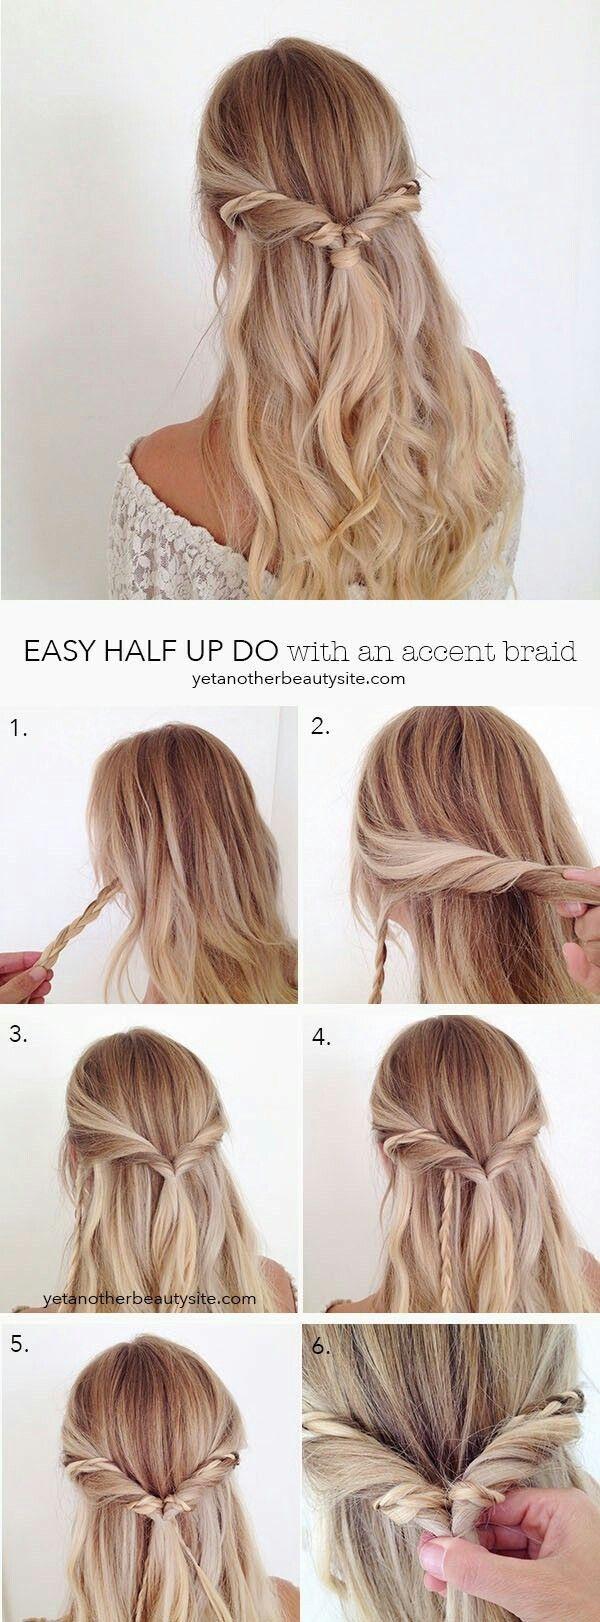 too easy! | braided | hair styles, hair, curly hair styles